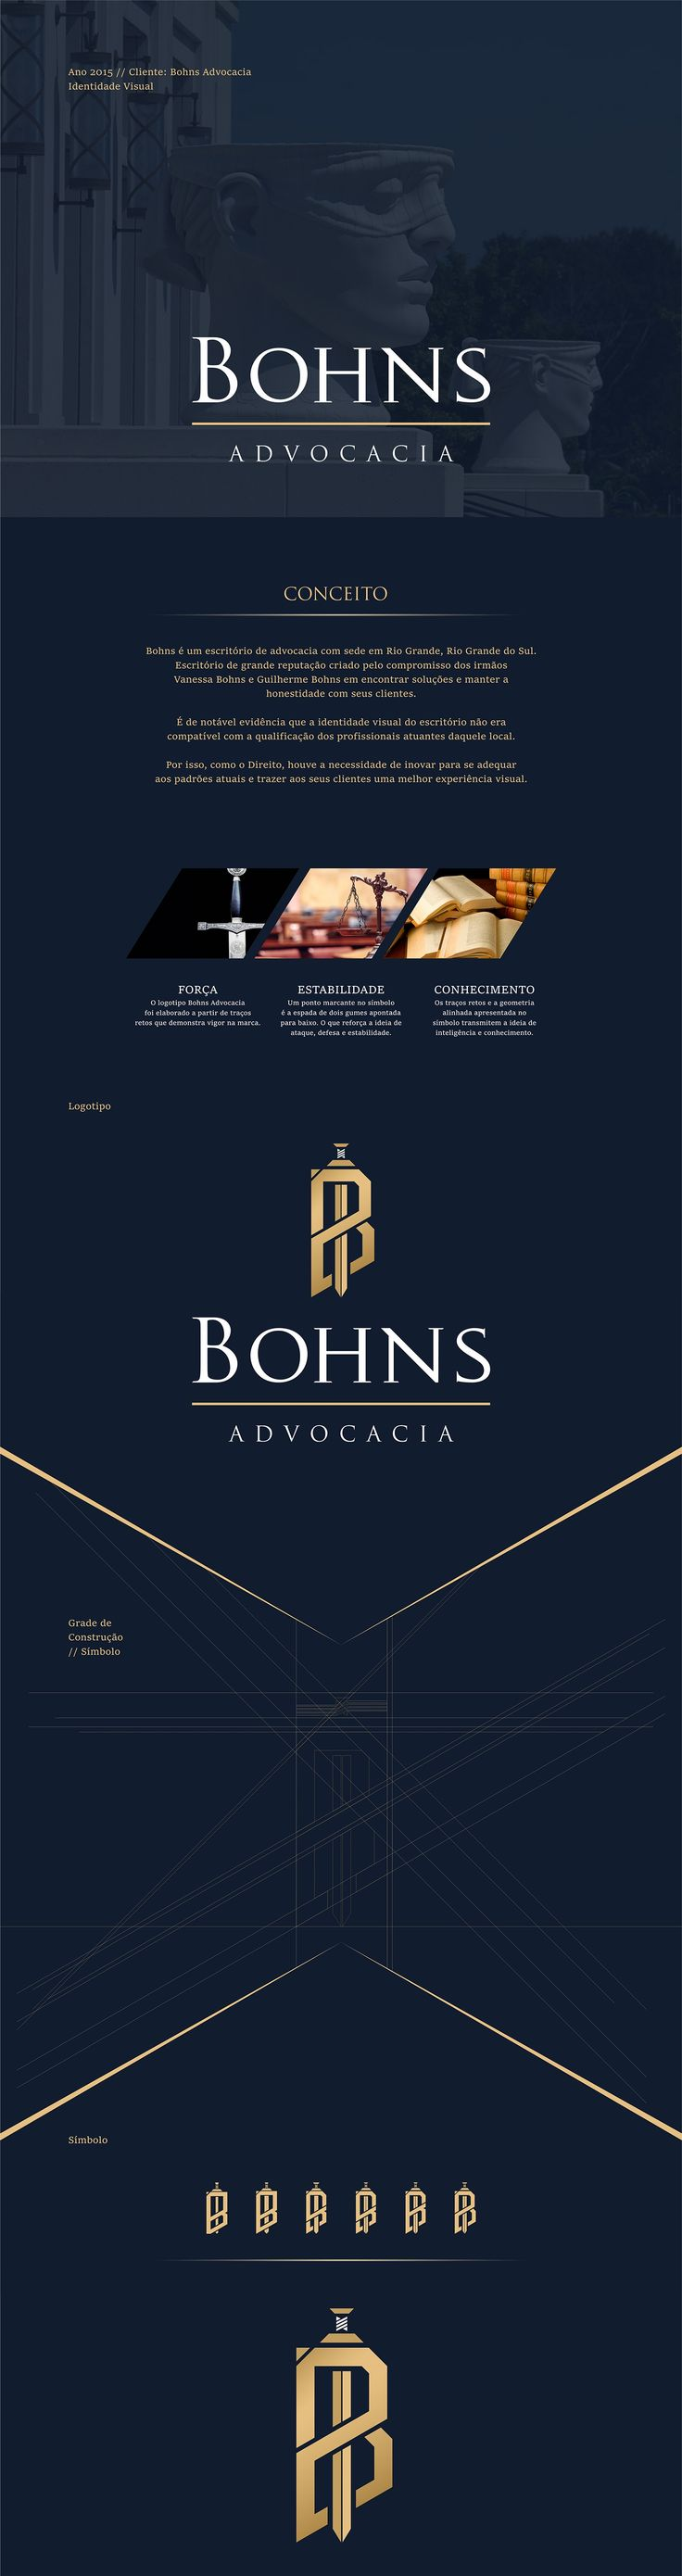 Bohns Advocacia // Branding on Behance